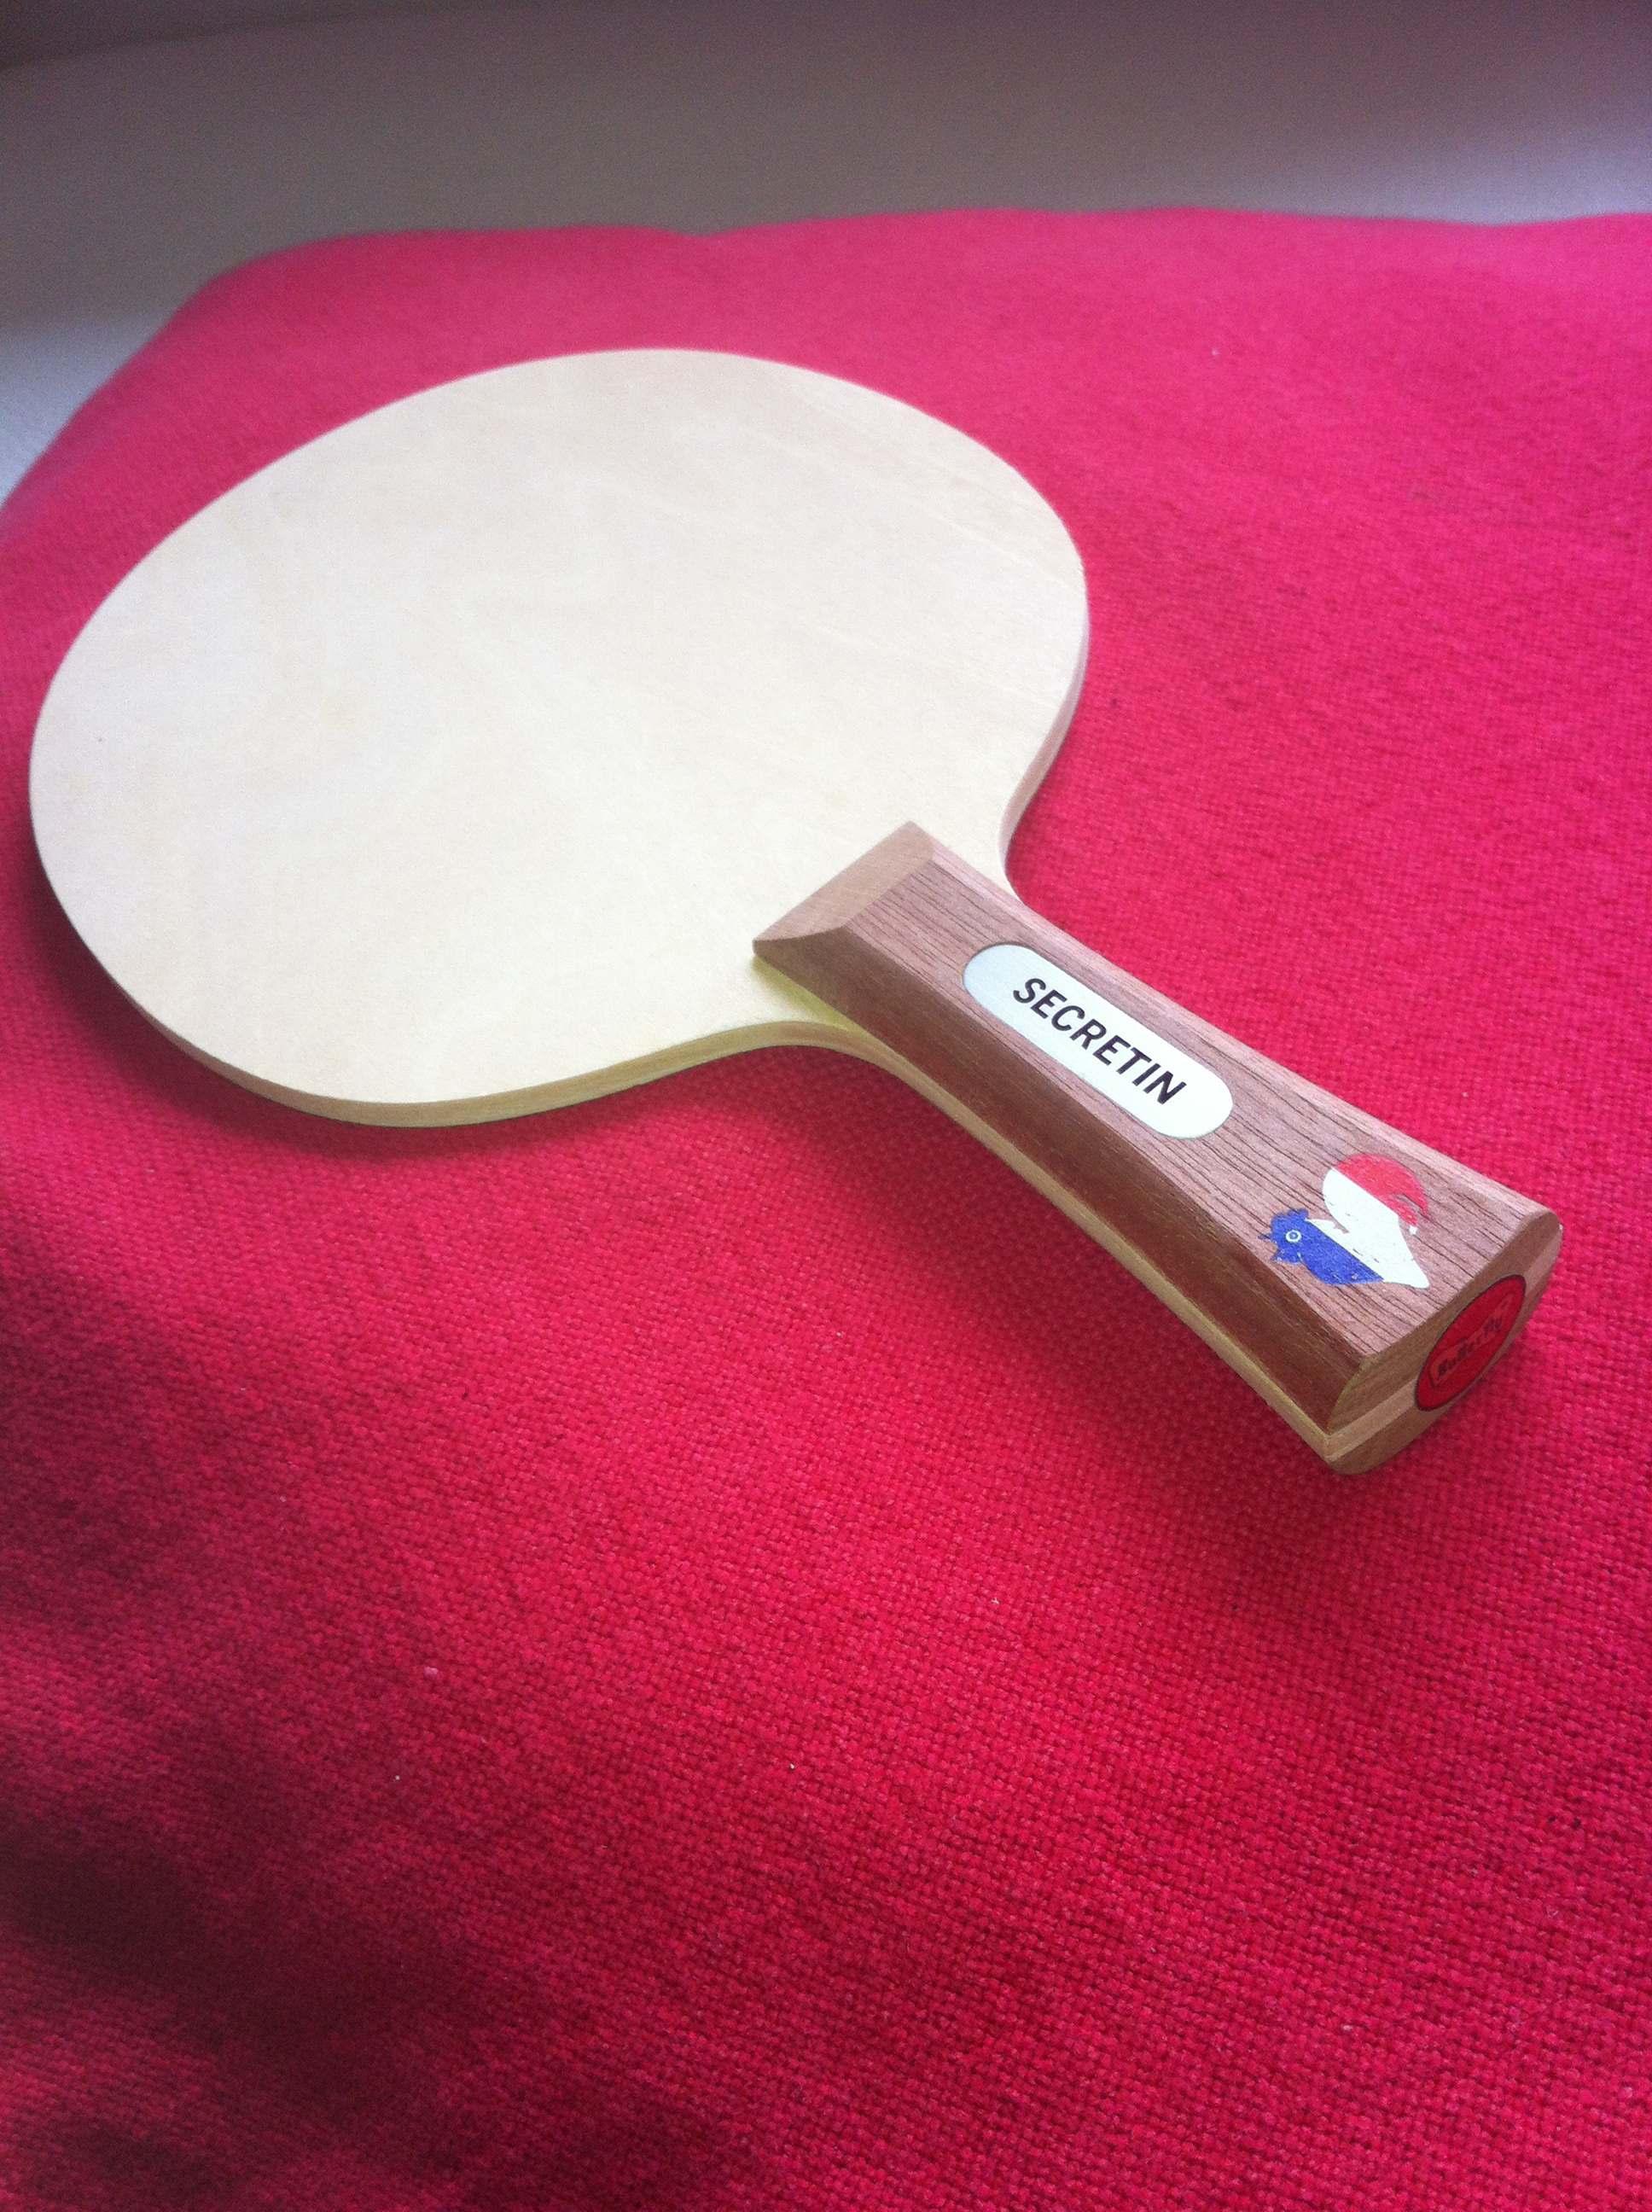 Table tennis porn